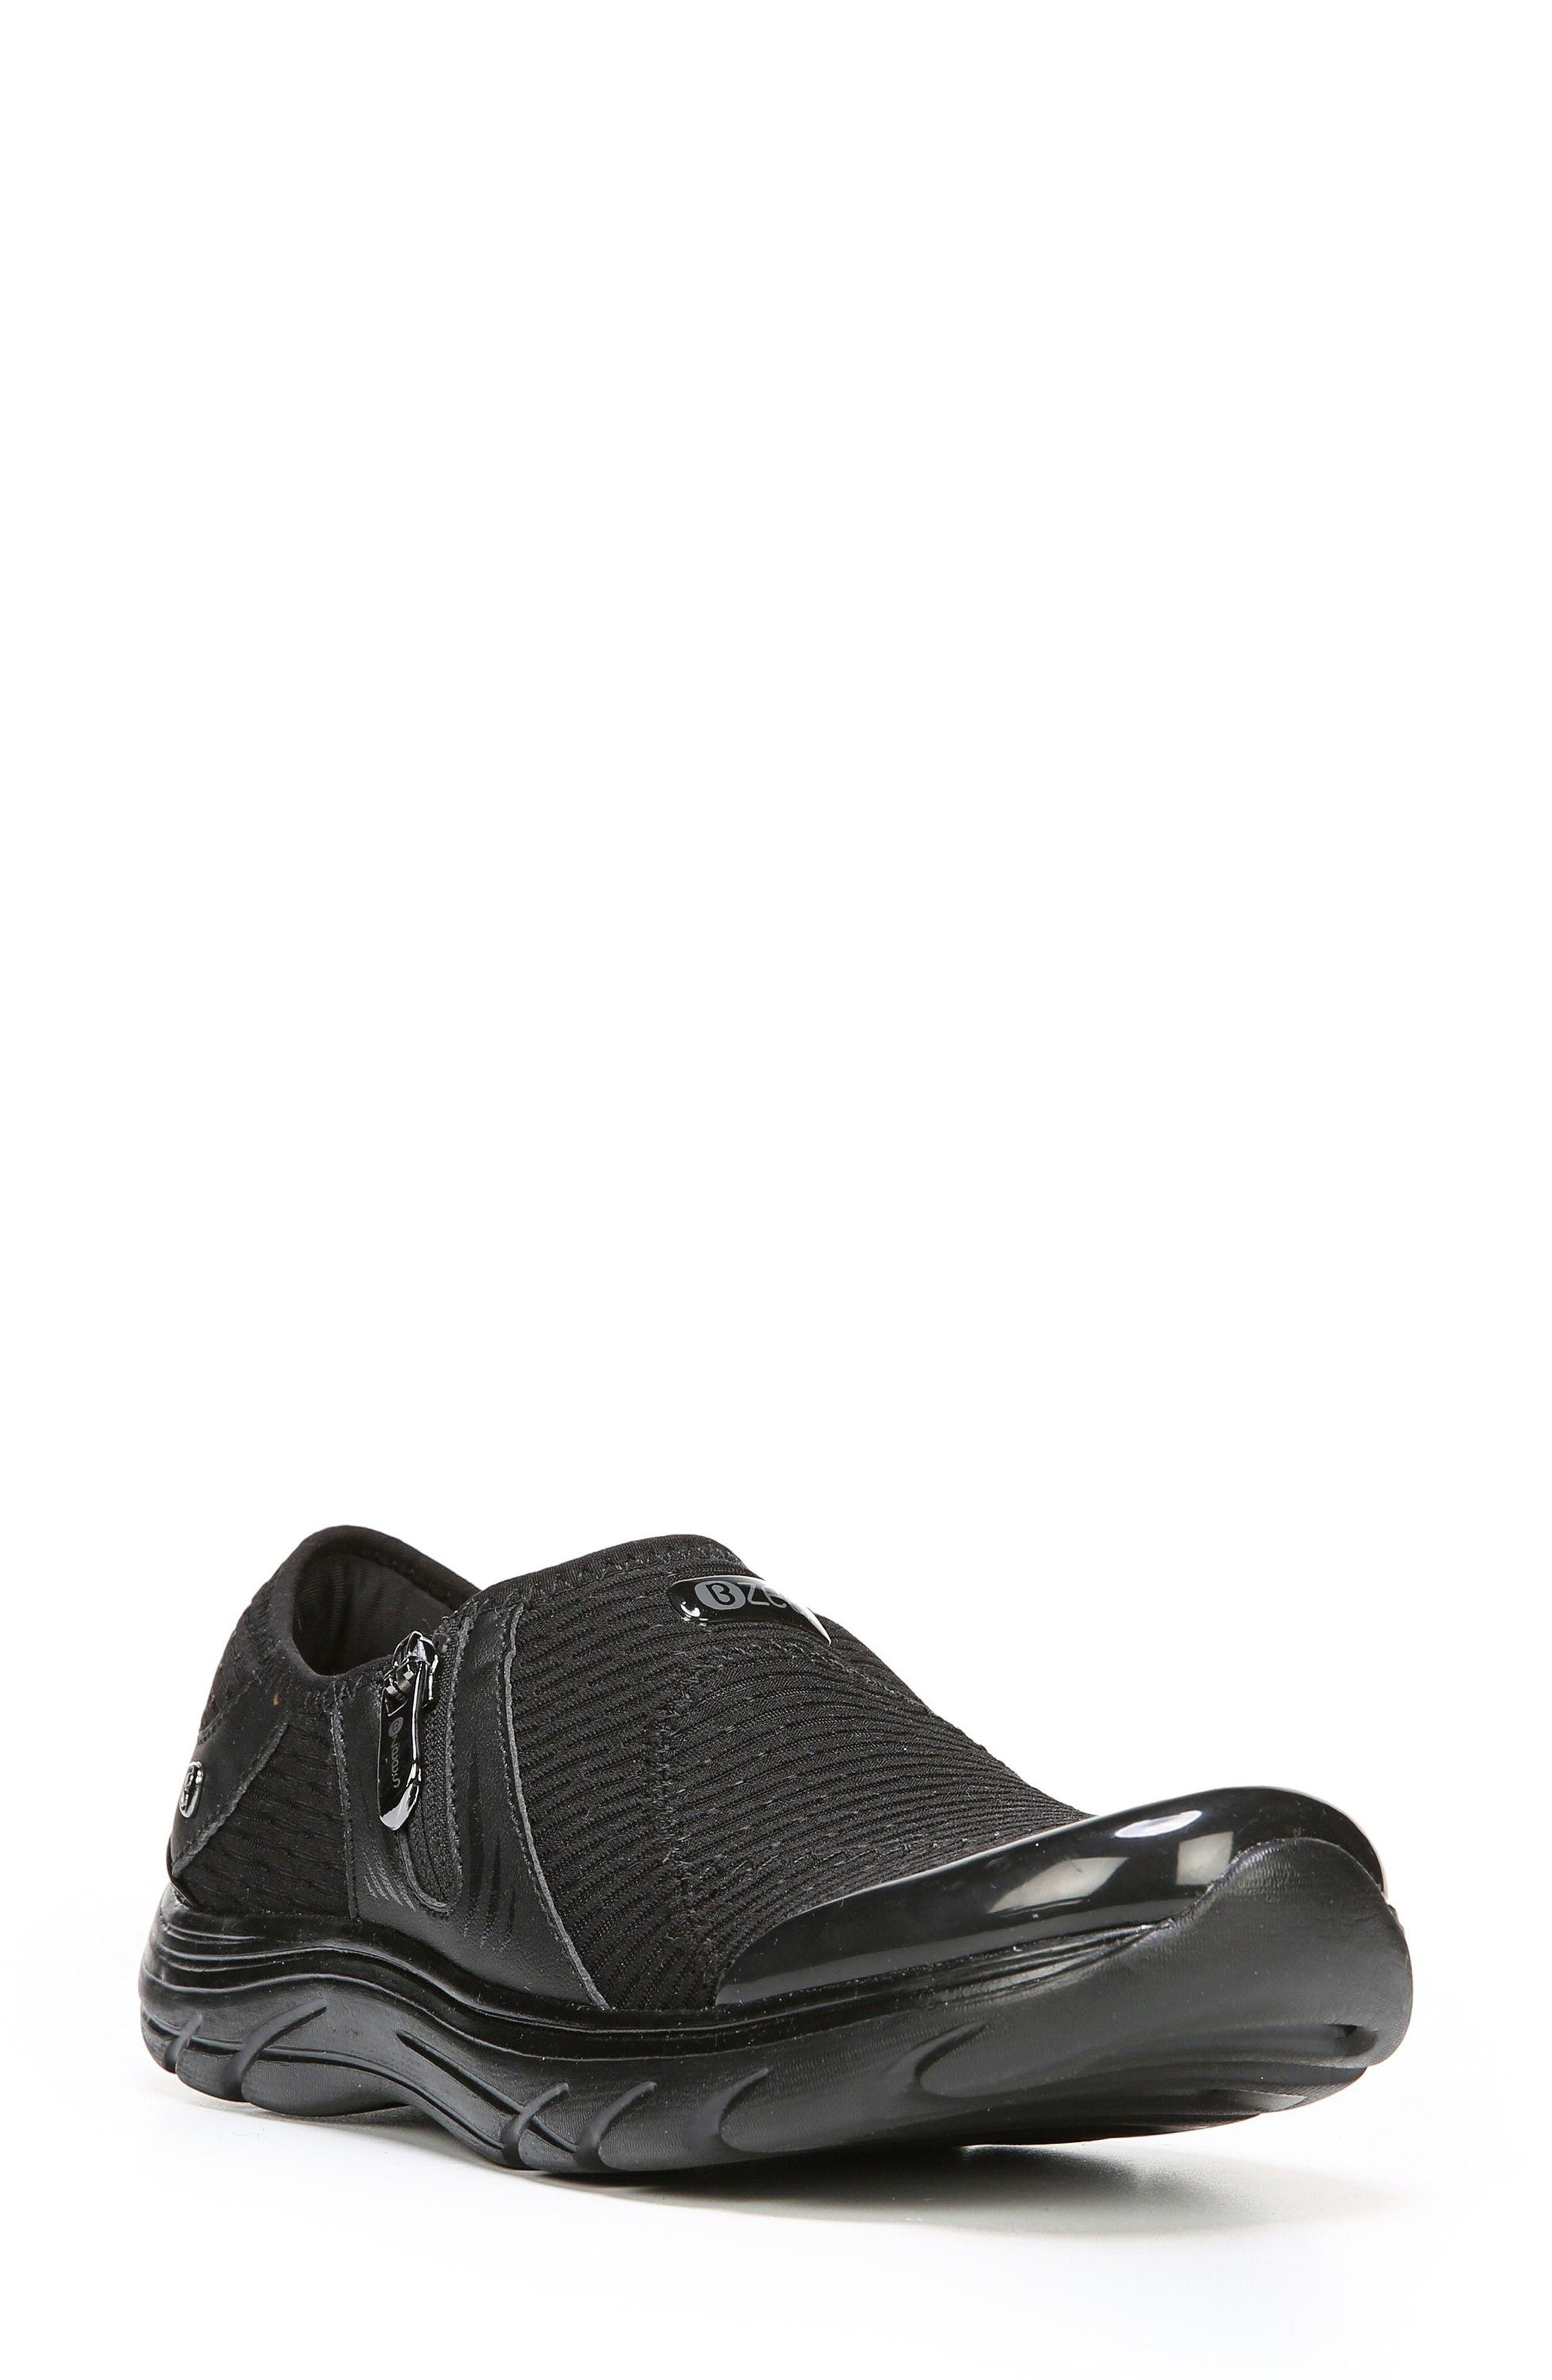 Balance Sneaker,                         Main,                         color, Black Oval Fabric